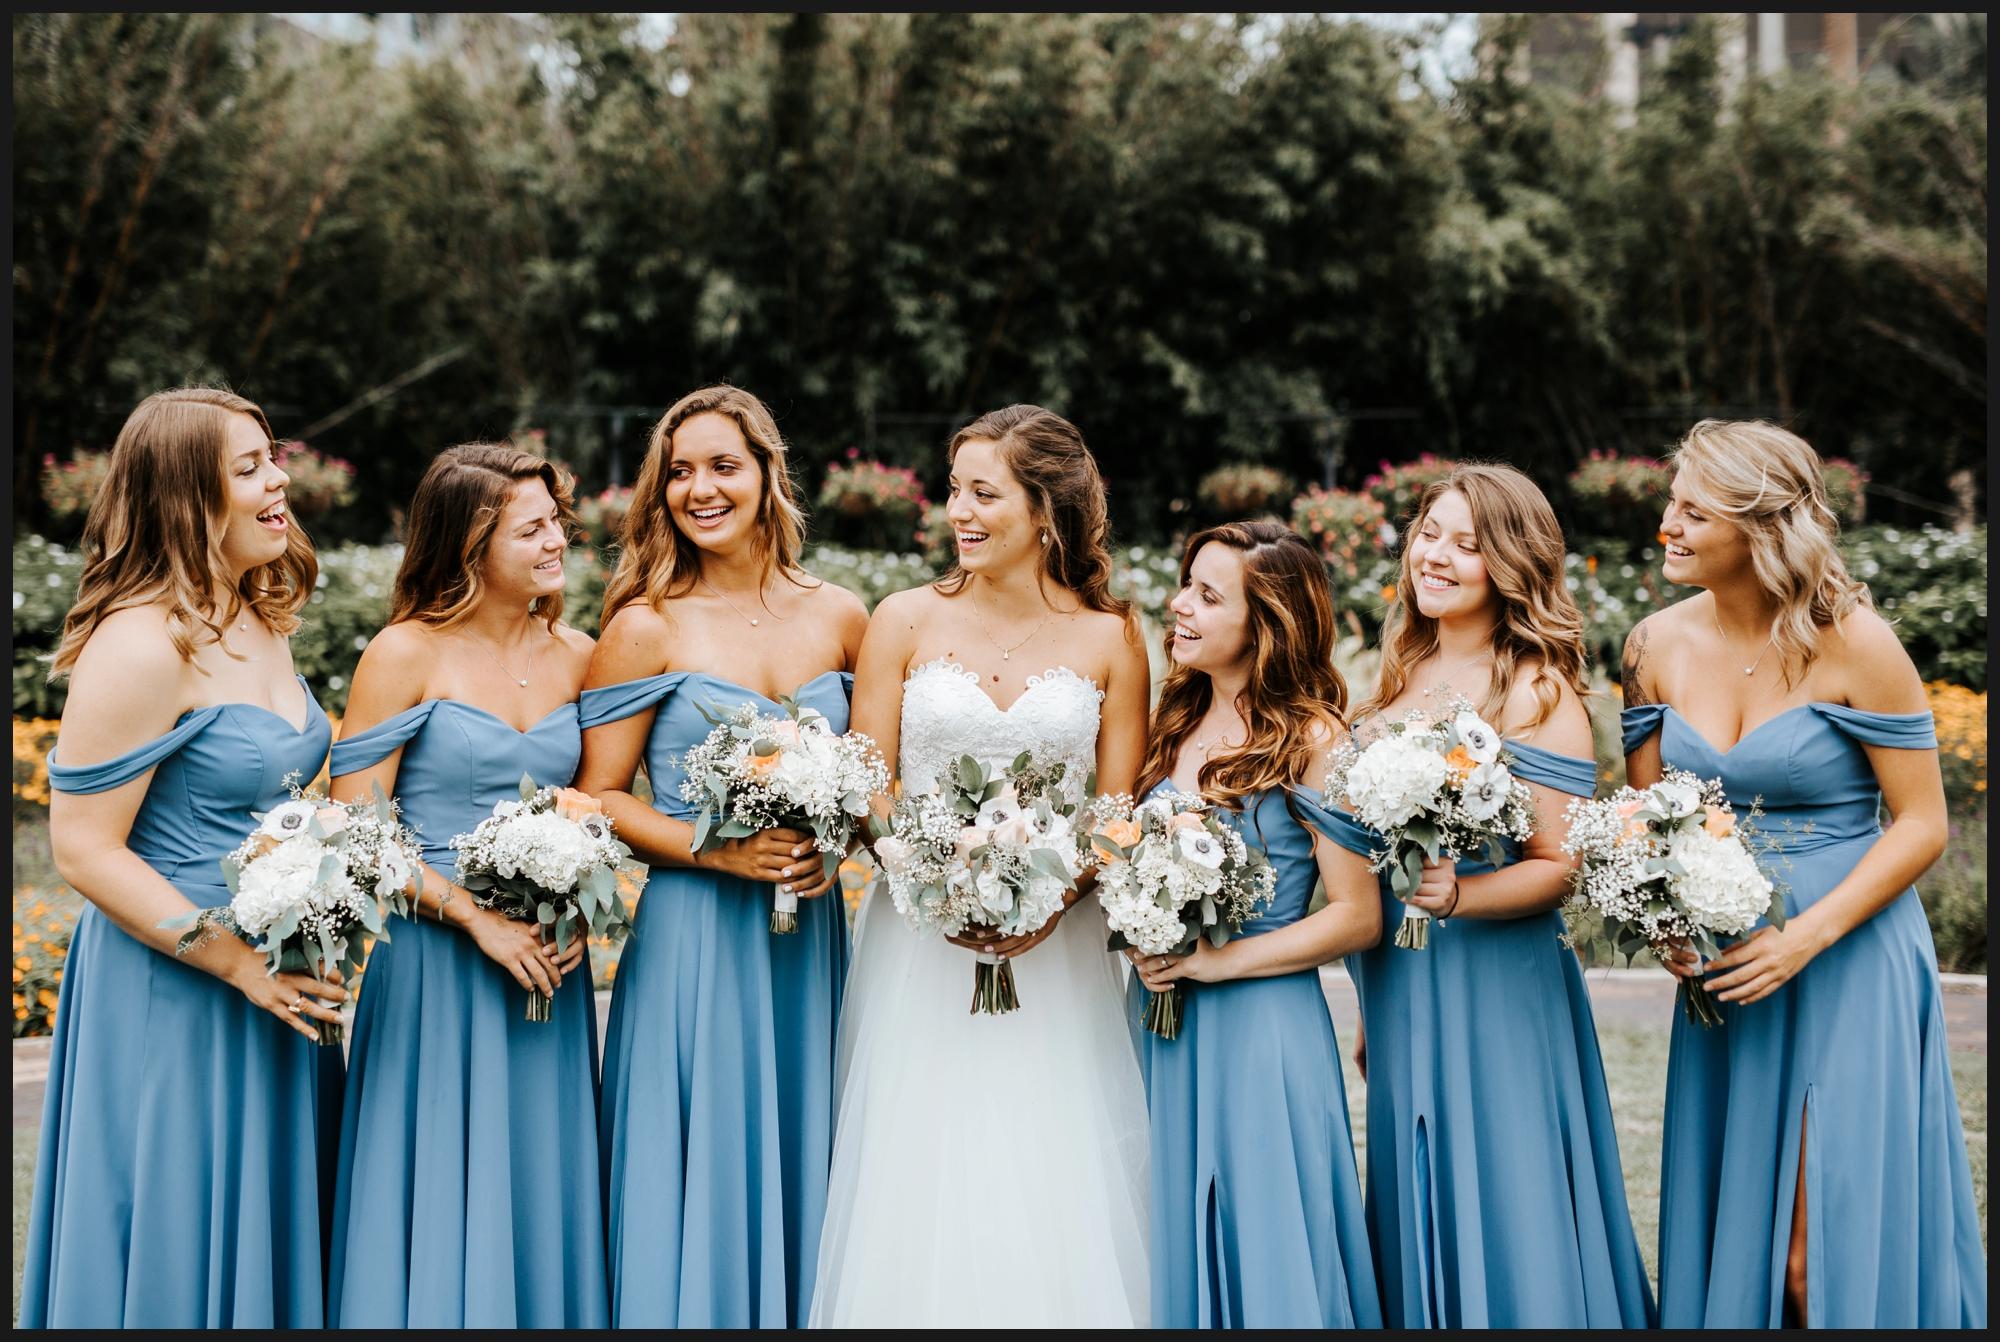 Orlando-Wedding-Photographer-destination-wedding-photographer-florida-wedding-photographer-bohemian-wedding-photographer_0033.jpg